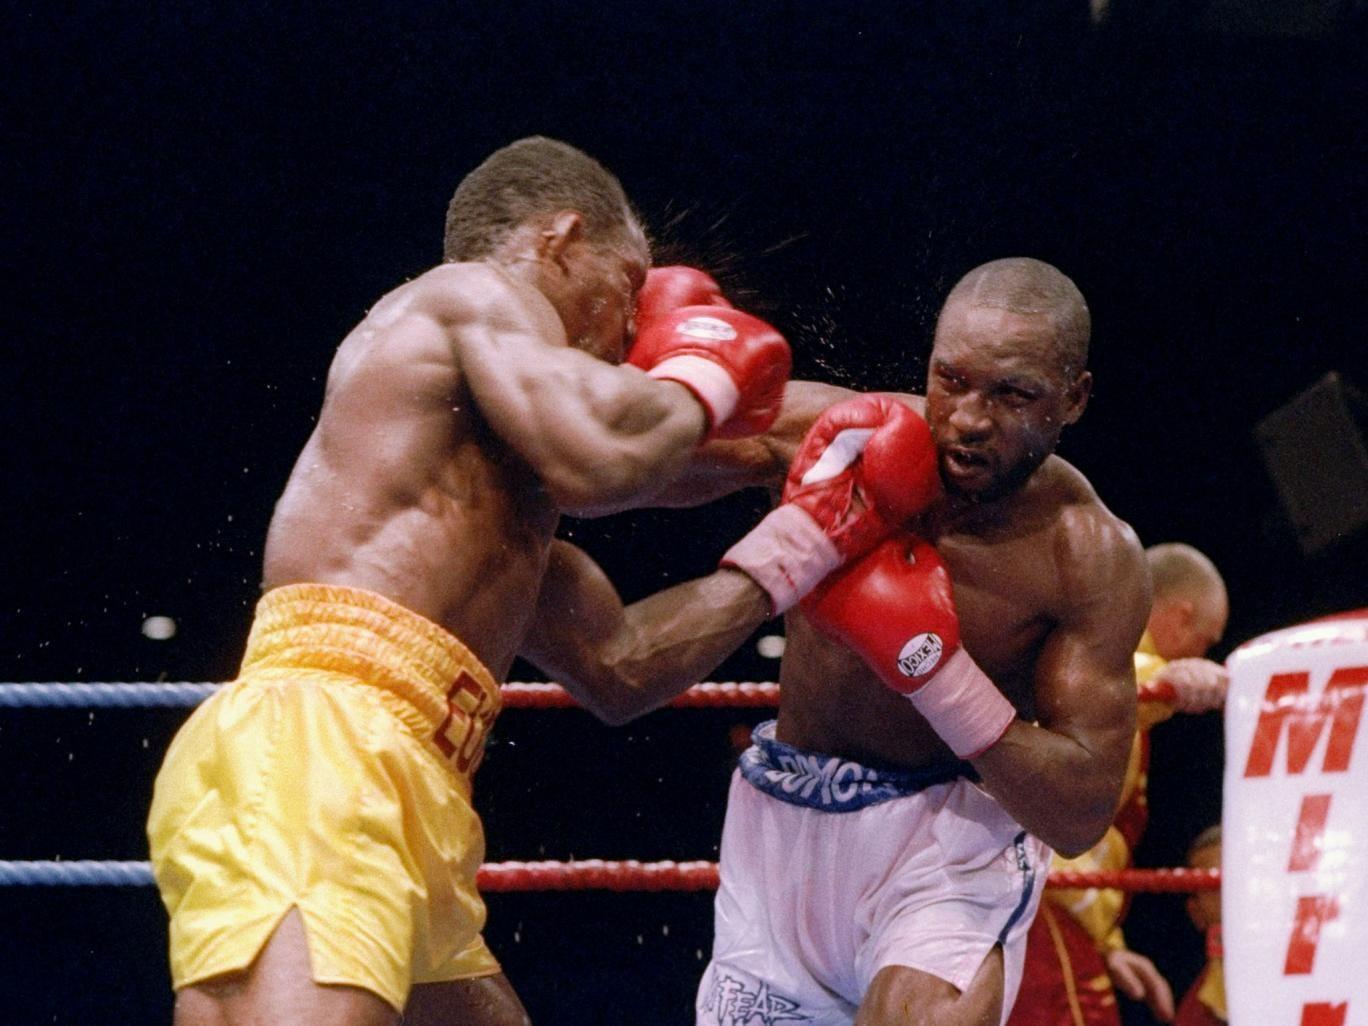 Nigel Benn (left) and Chris Eubank fought a grudge match in 1993